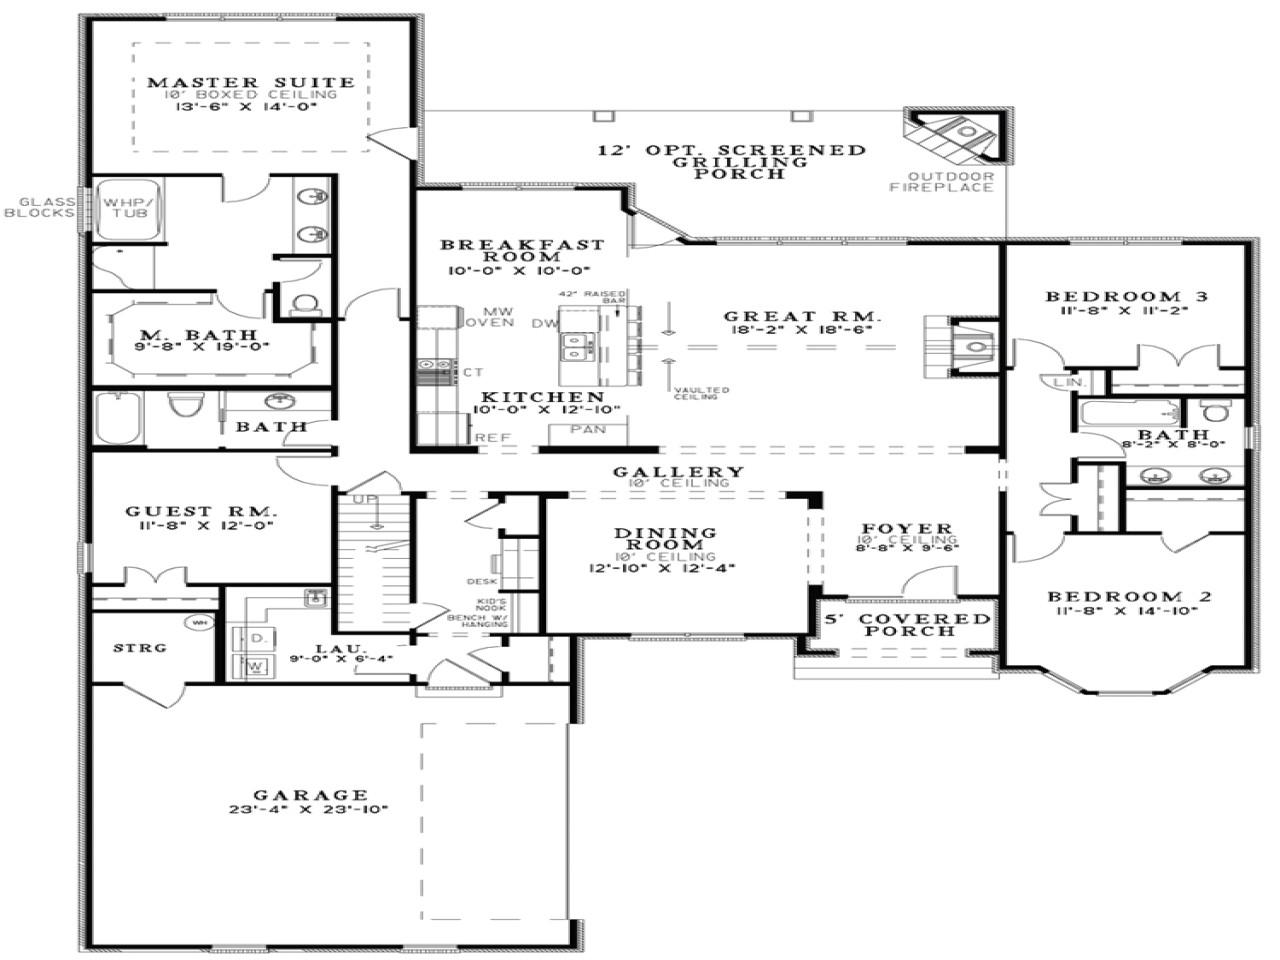 a13397be694d608f open floor plan house designs small open floor plans